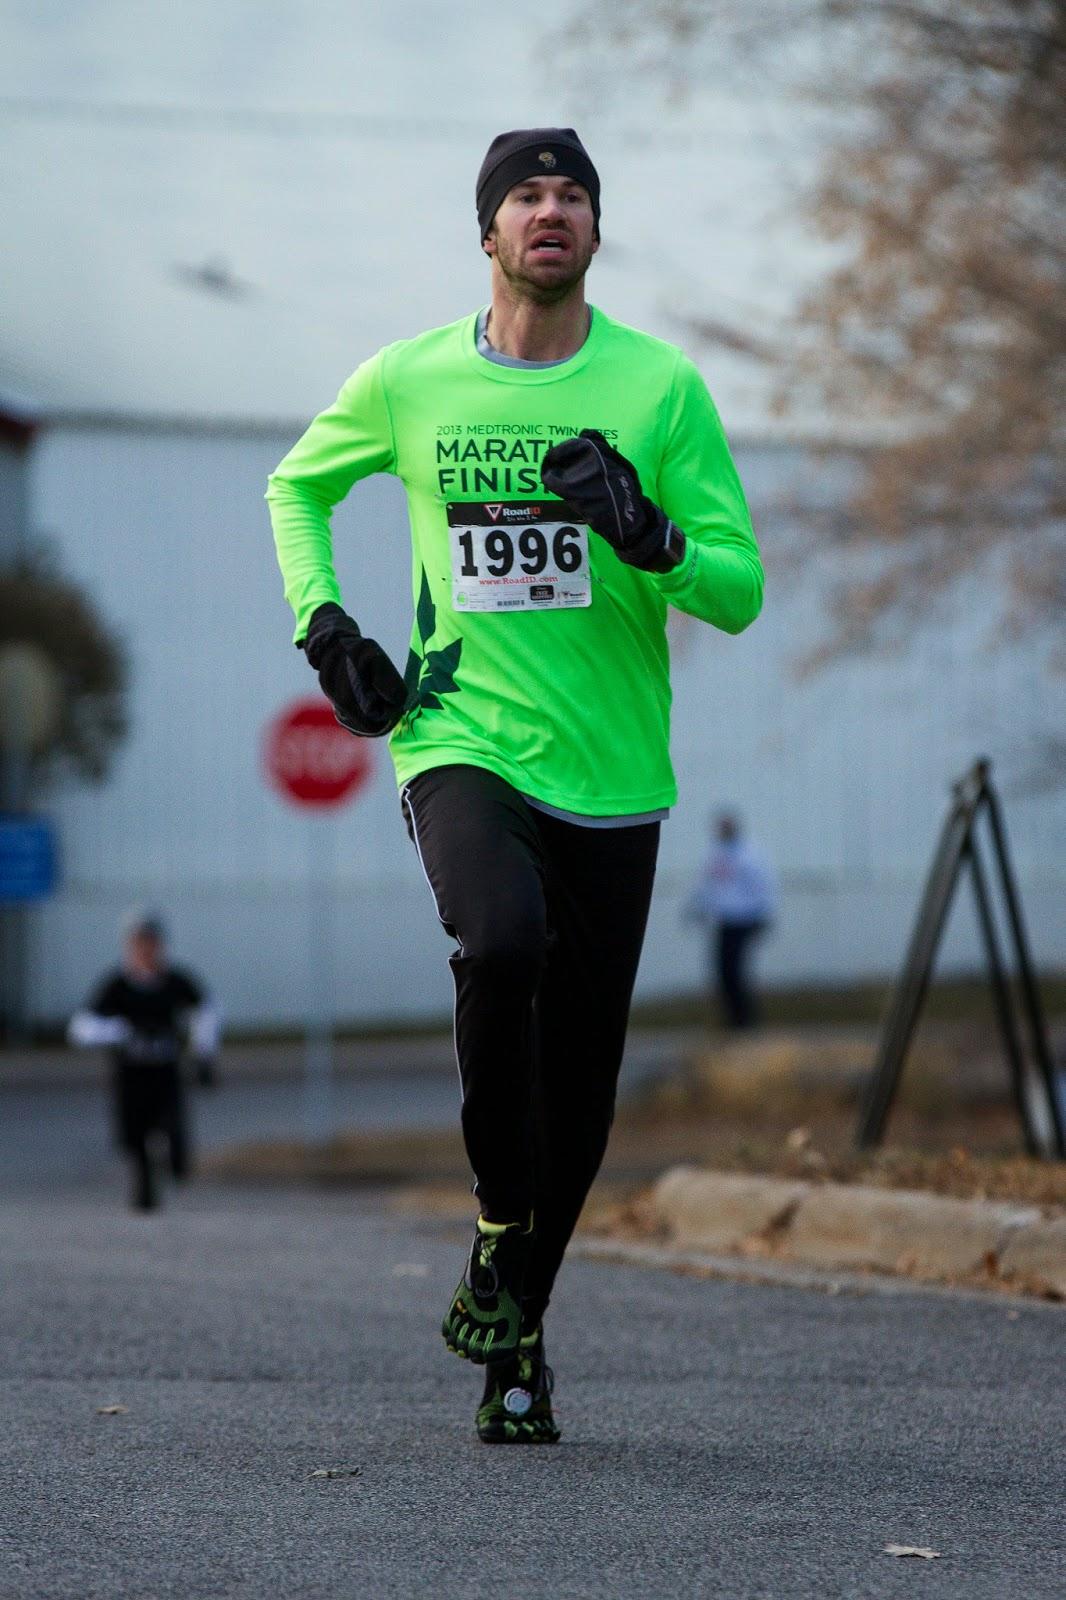 Best your 5k PR on 10 miles per week